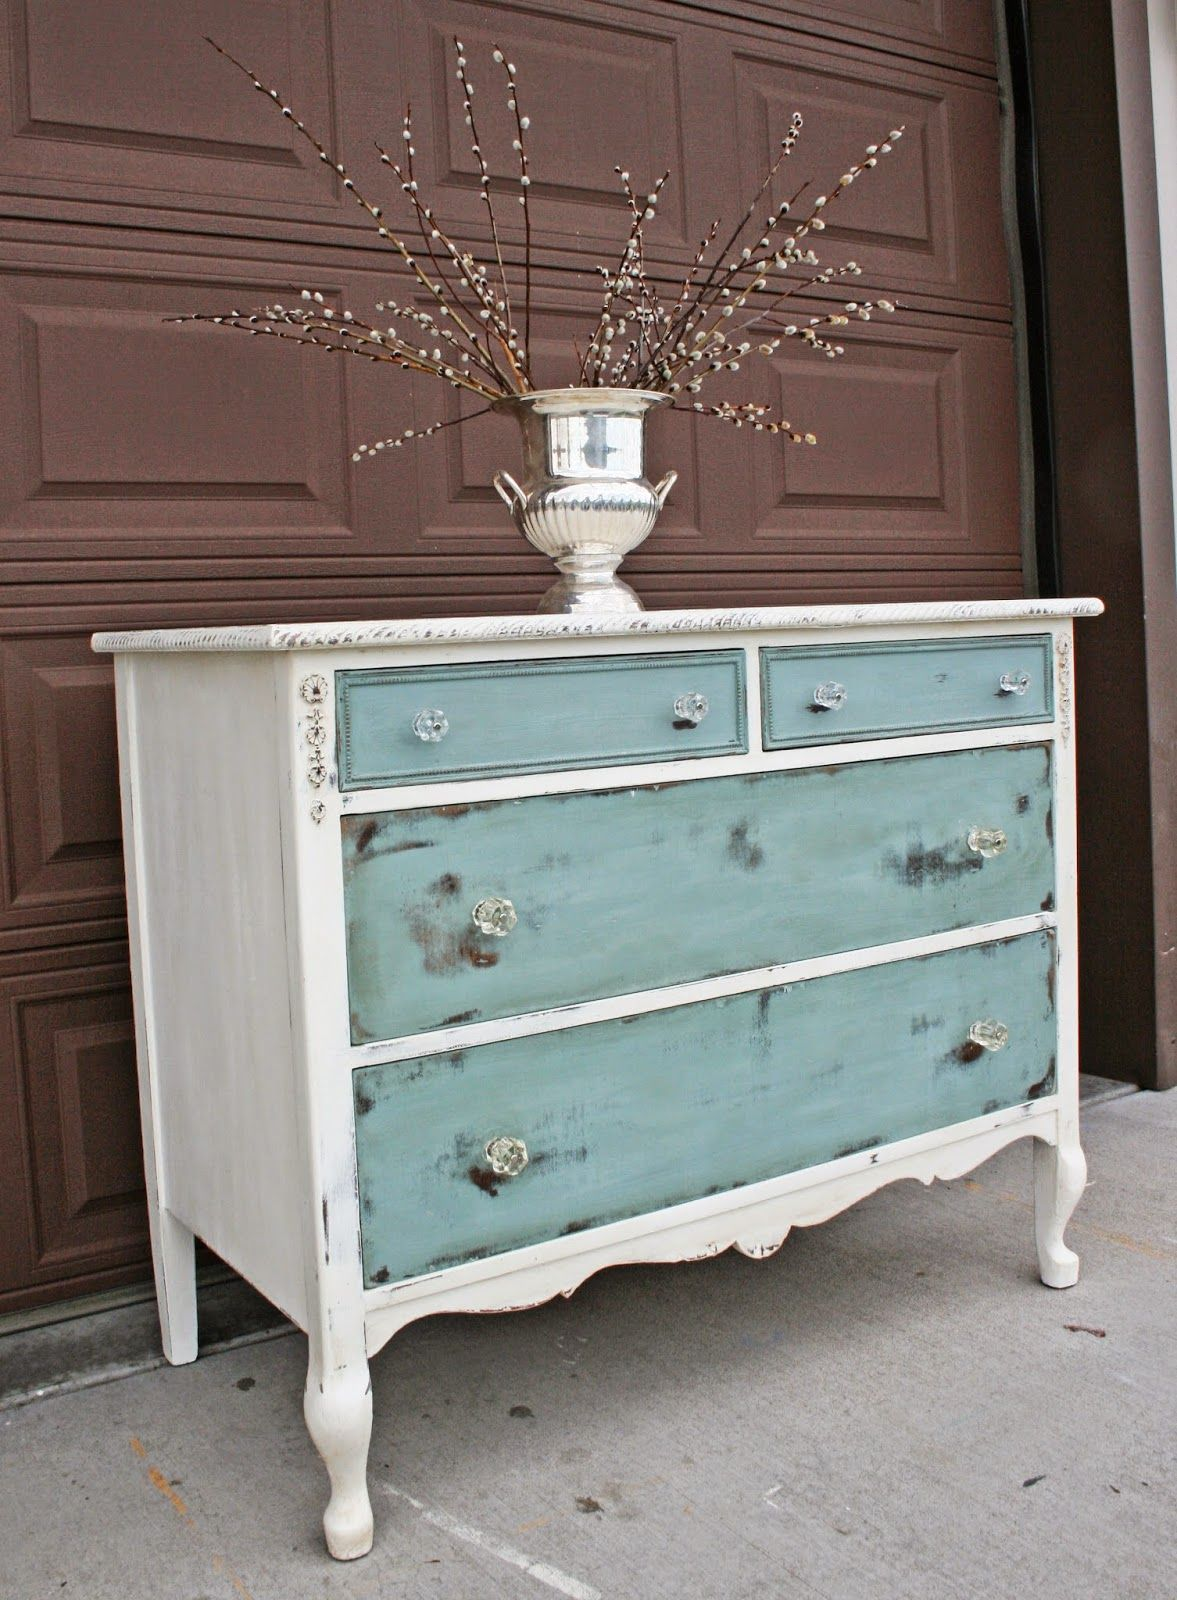 Distressed Vintage Bedroom Inspiration: Antique Recreation: At Long Last...